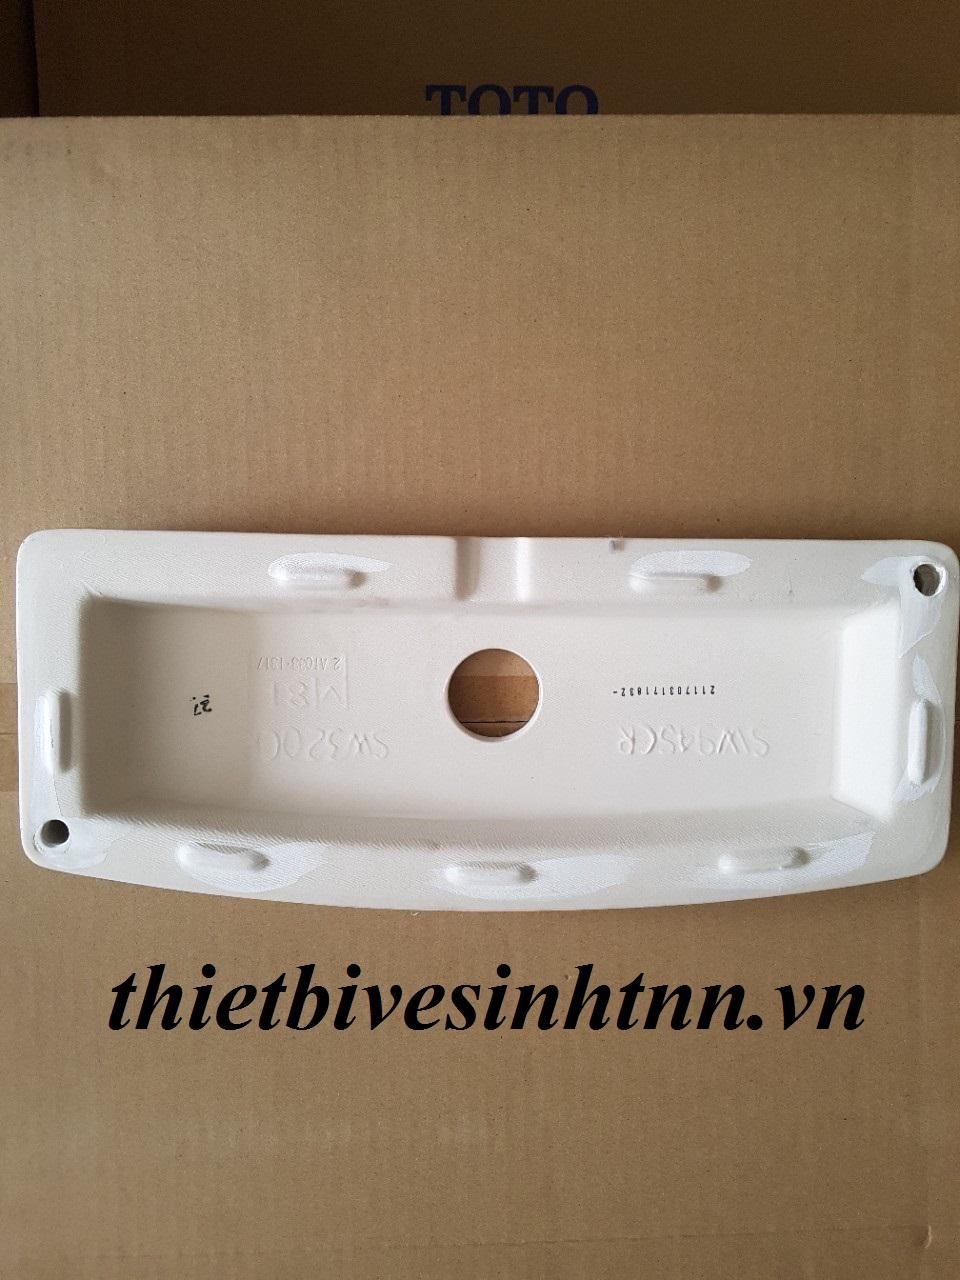 nap-ket-nuoc-ban-cau-toto-HSW945NCRV